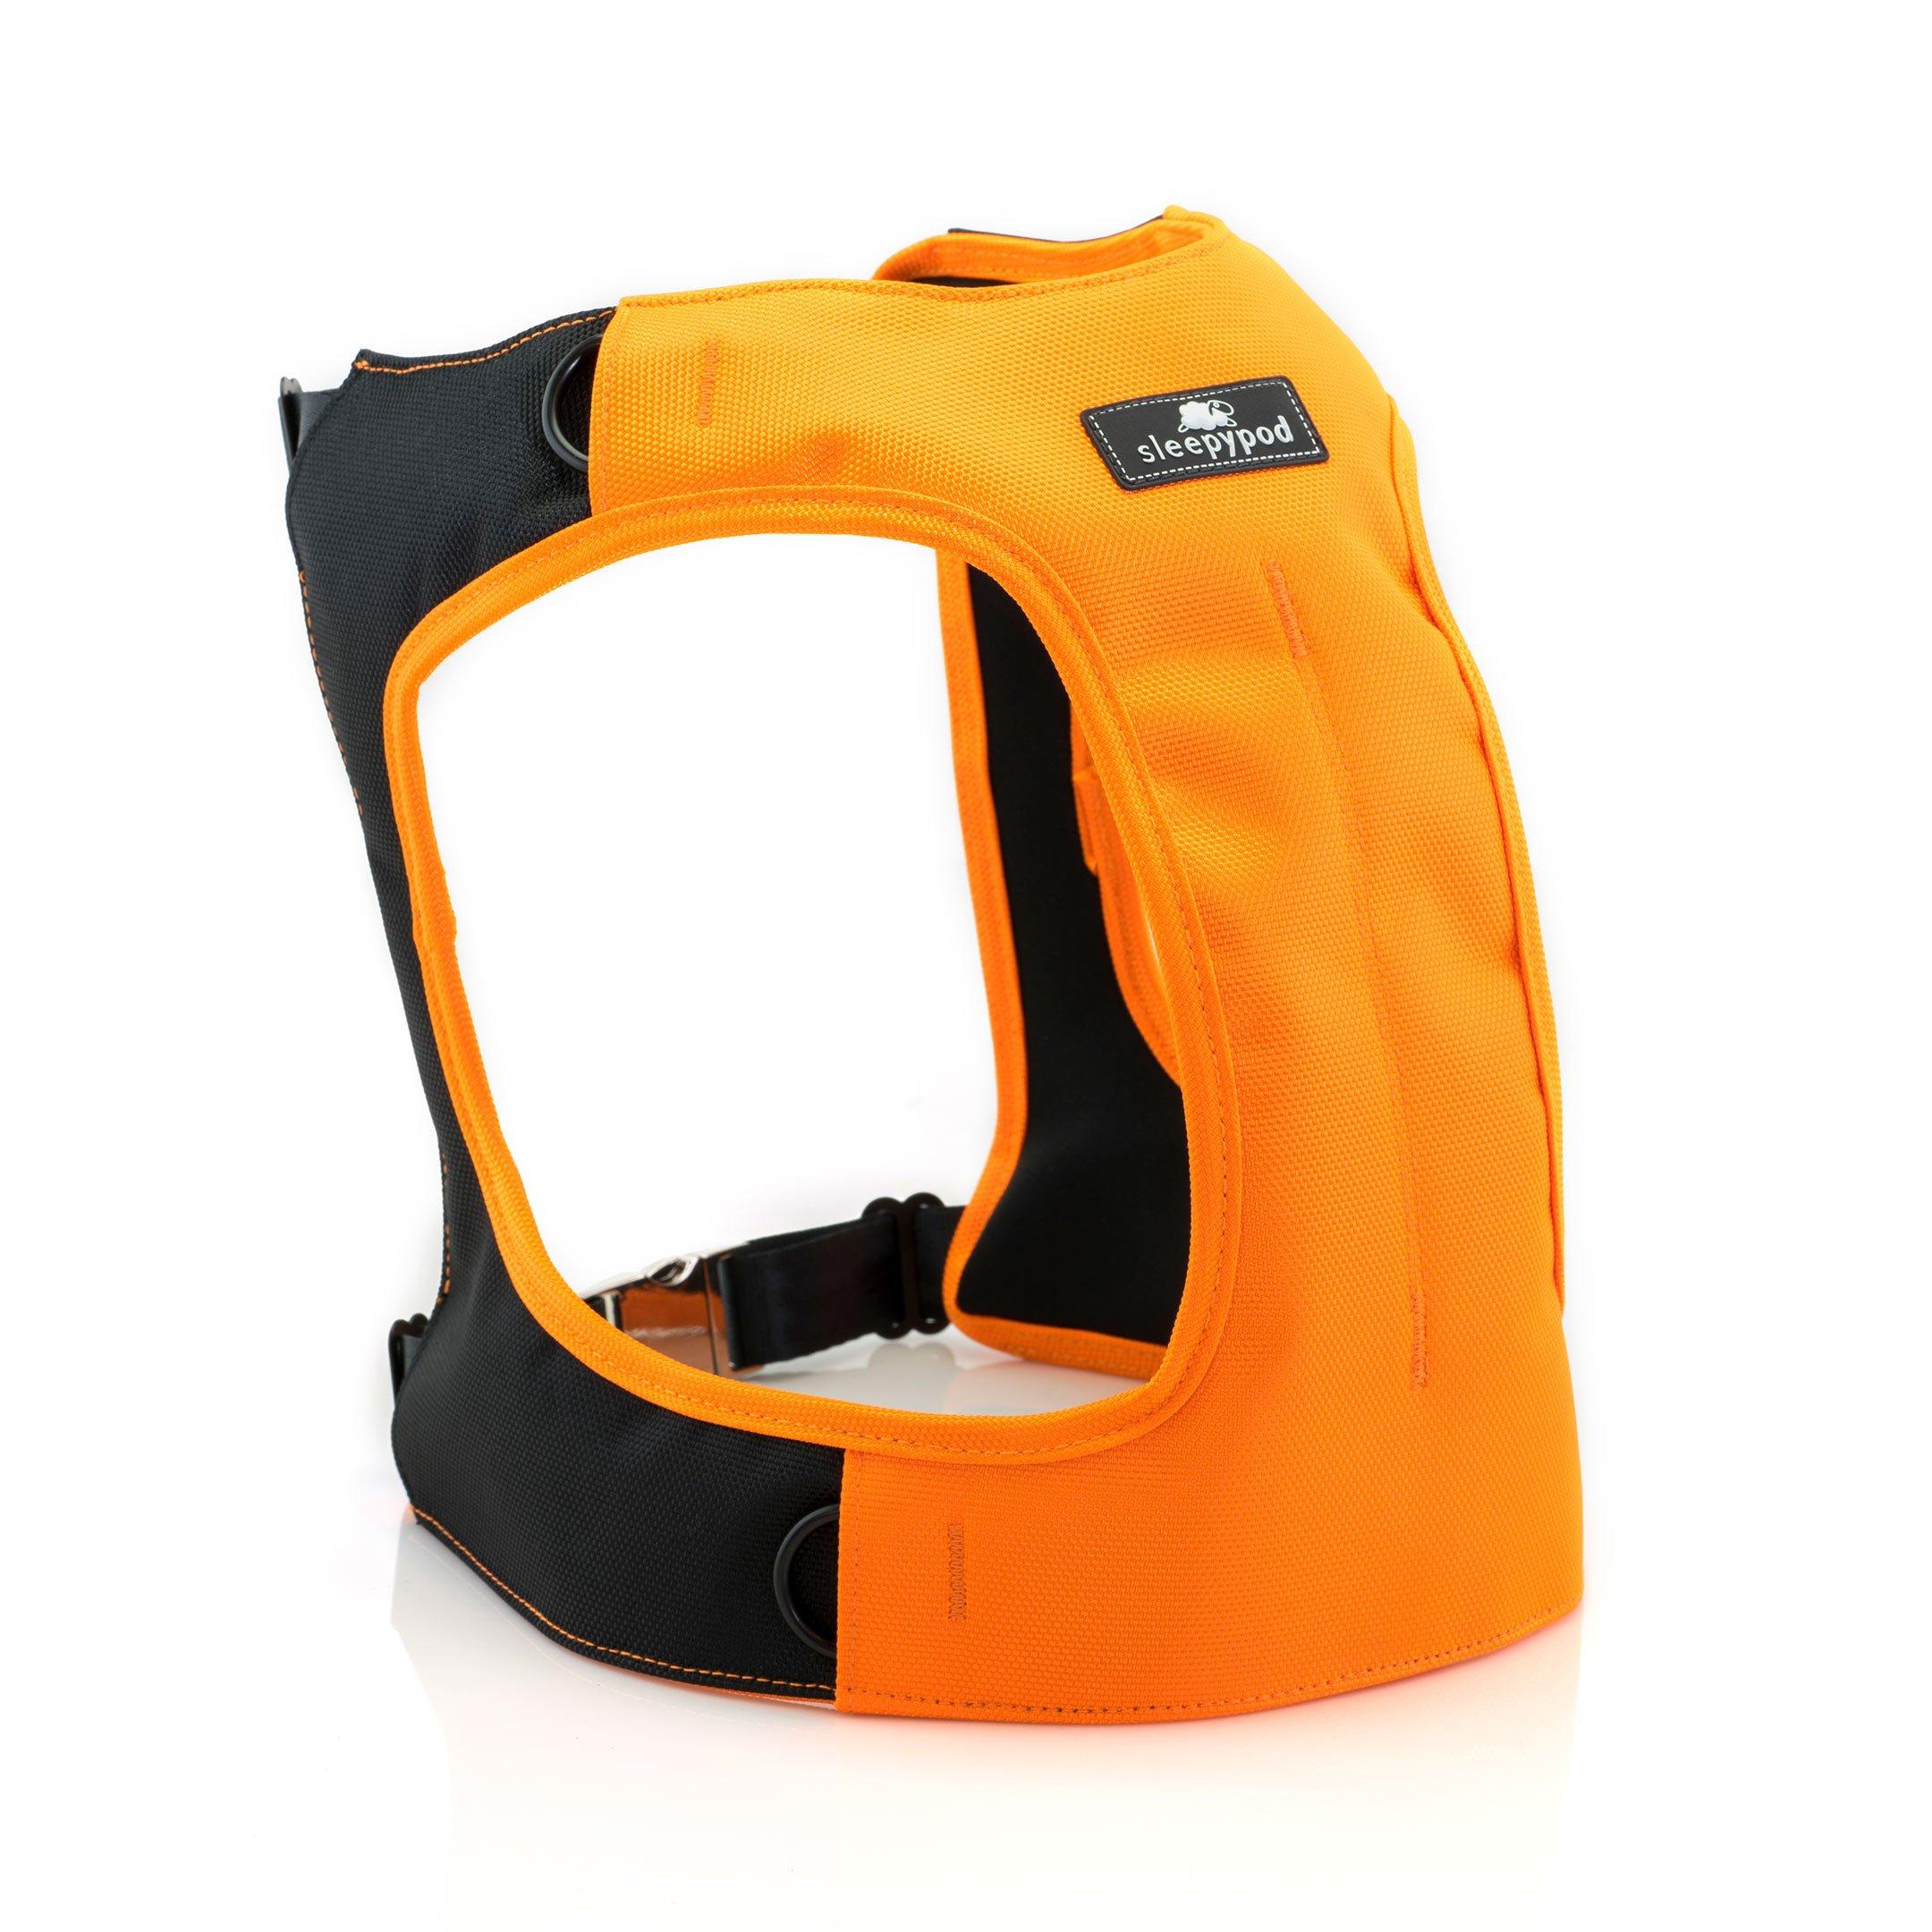 Clickit Terrain Dog Safety Harness ( Orange - Large )